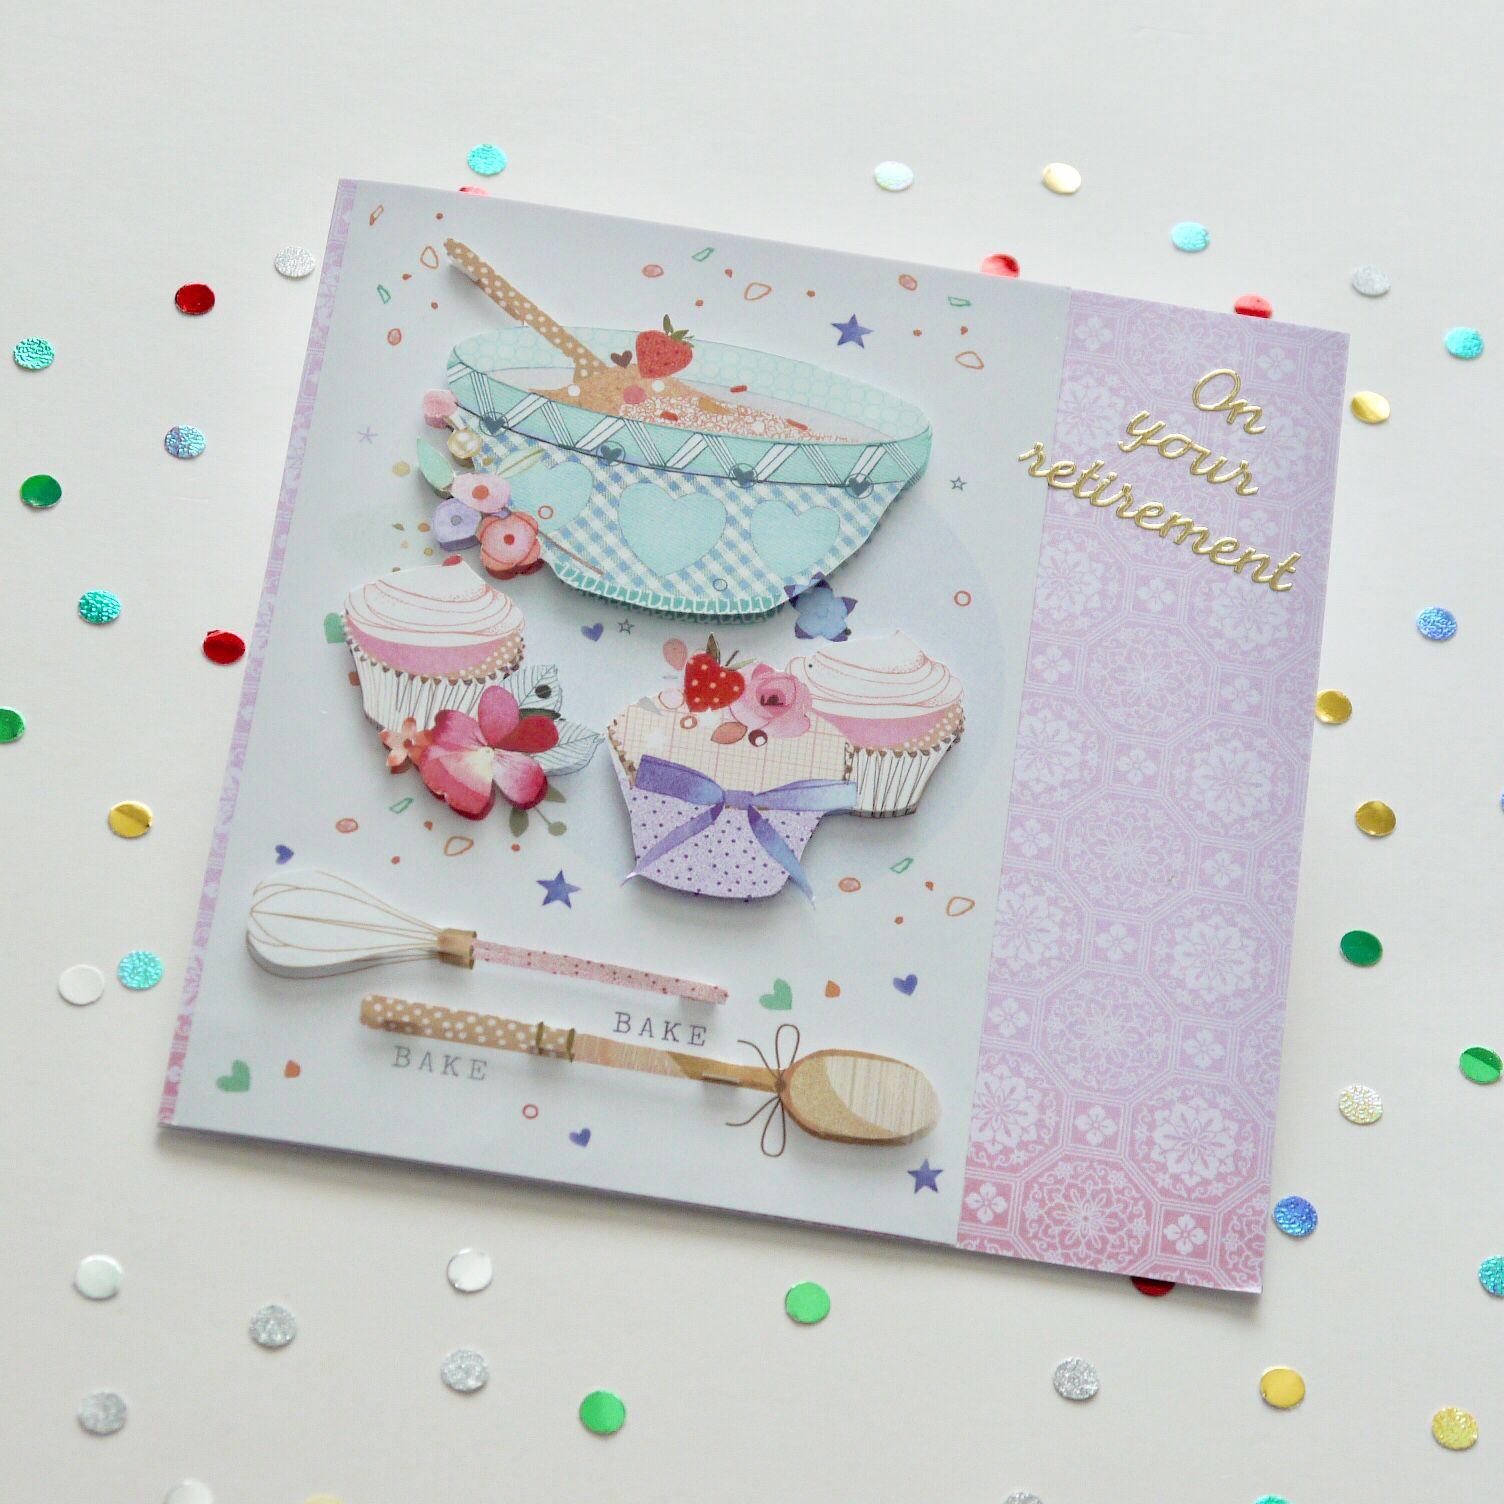 Personalised Handmade Retirement Card - Handmade Cards ... |Handmade Retirement Cards